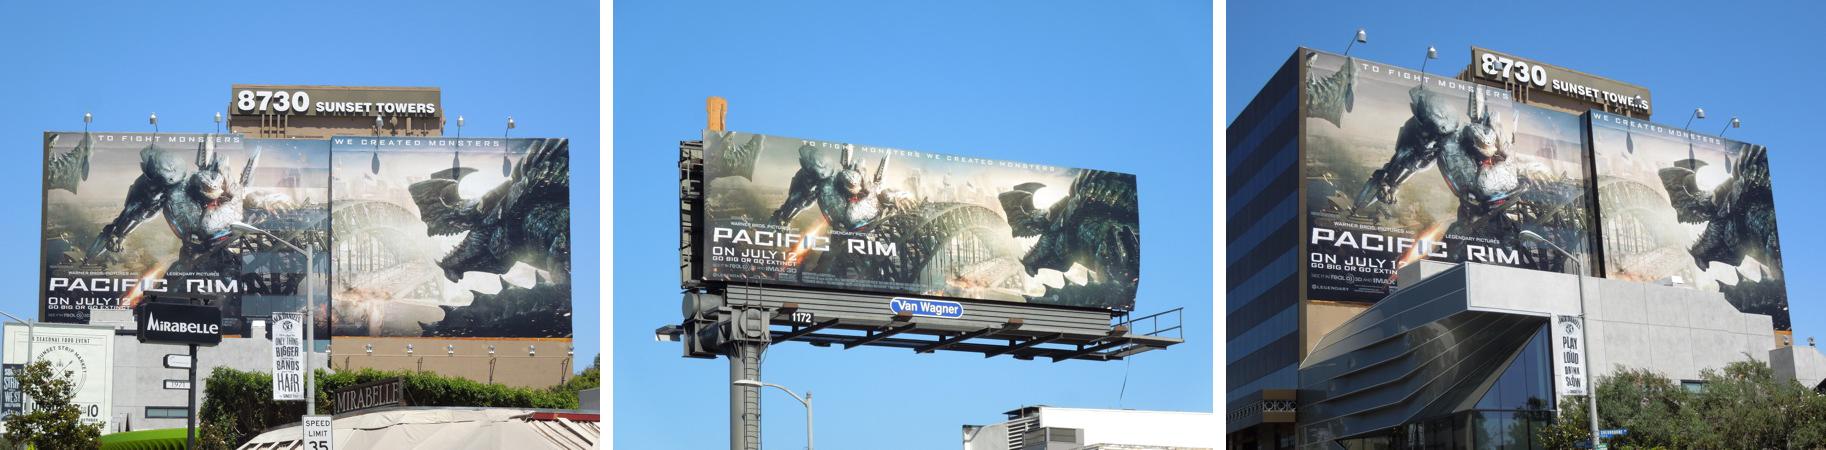 billboardposter.png